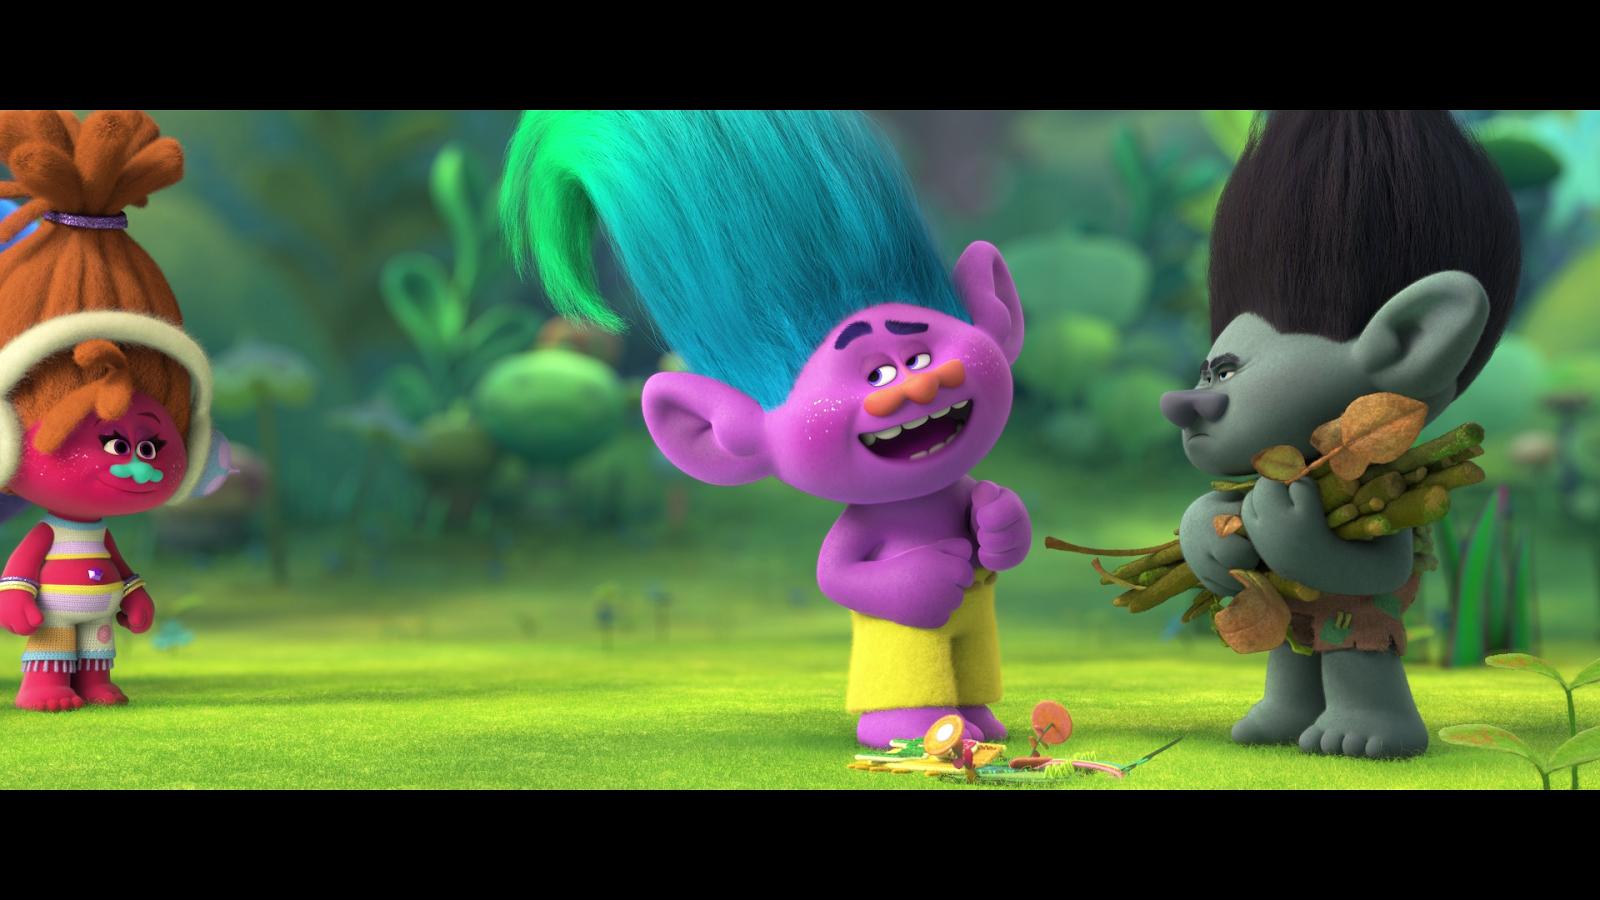 Trolls (2016) 1080p BD25 LATINO 2